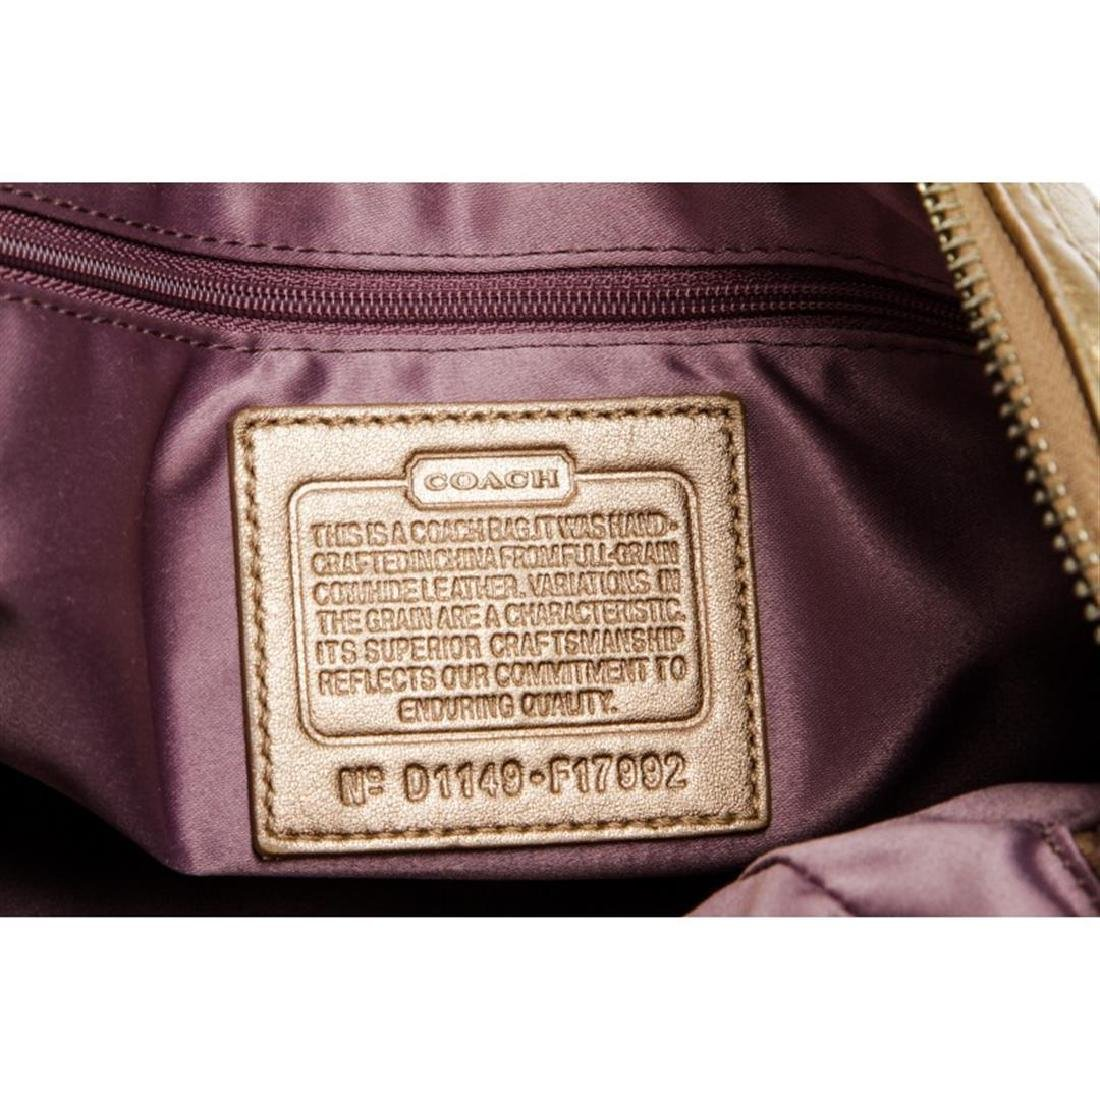 Coach Metallic Gold Monogram Leather Tote Bag - 8